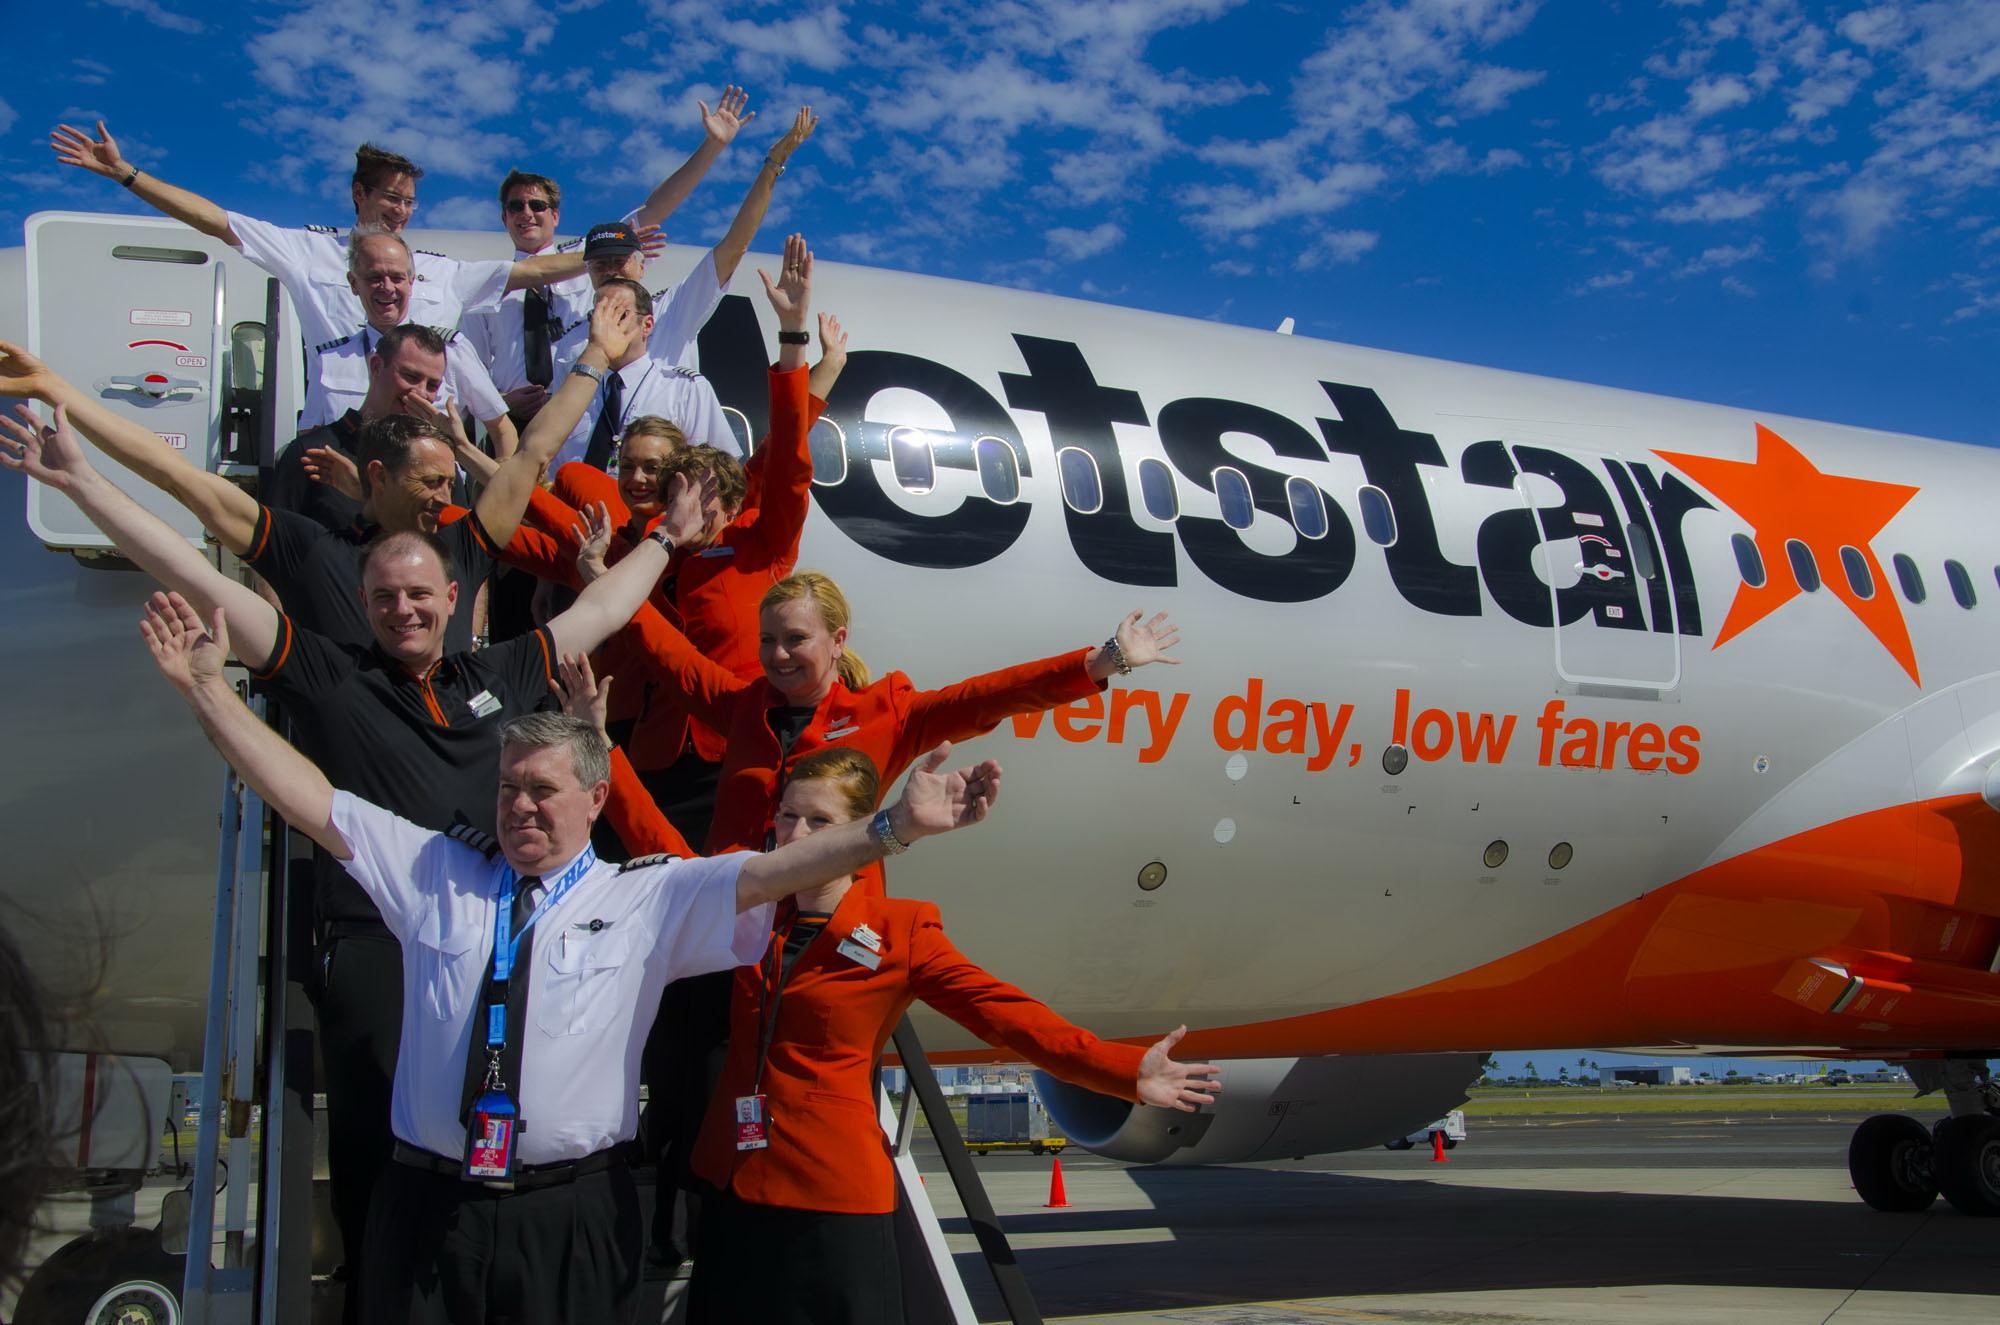 Vé máy bay giá rẻ Jetstar tháng 2